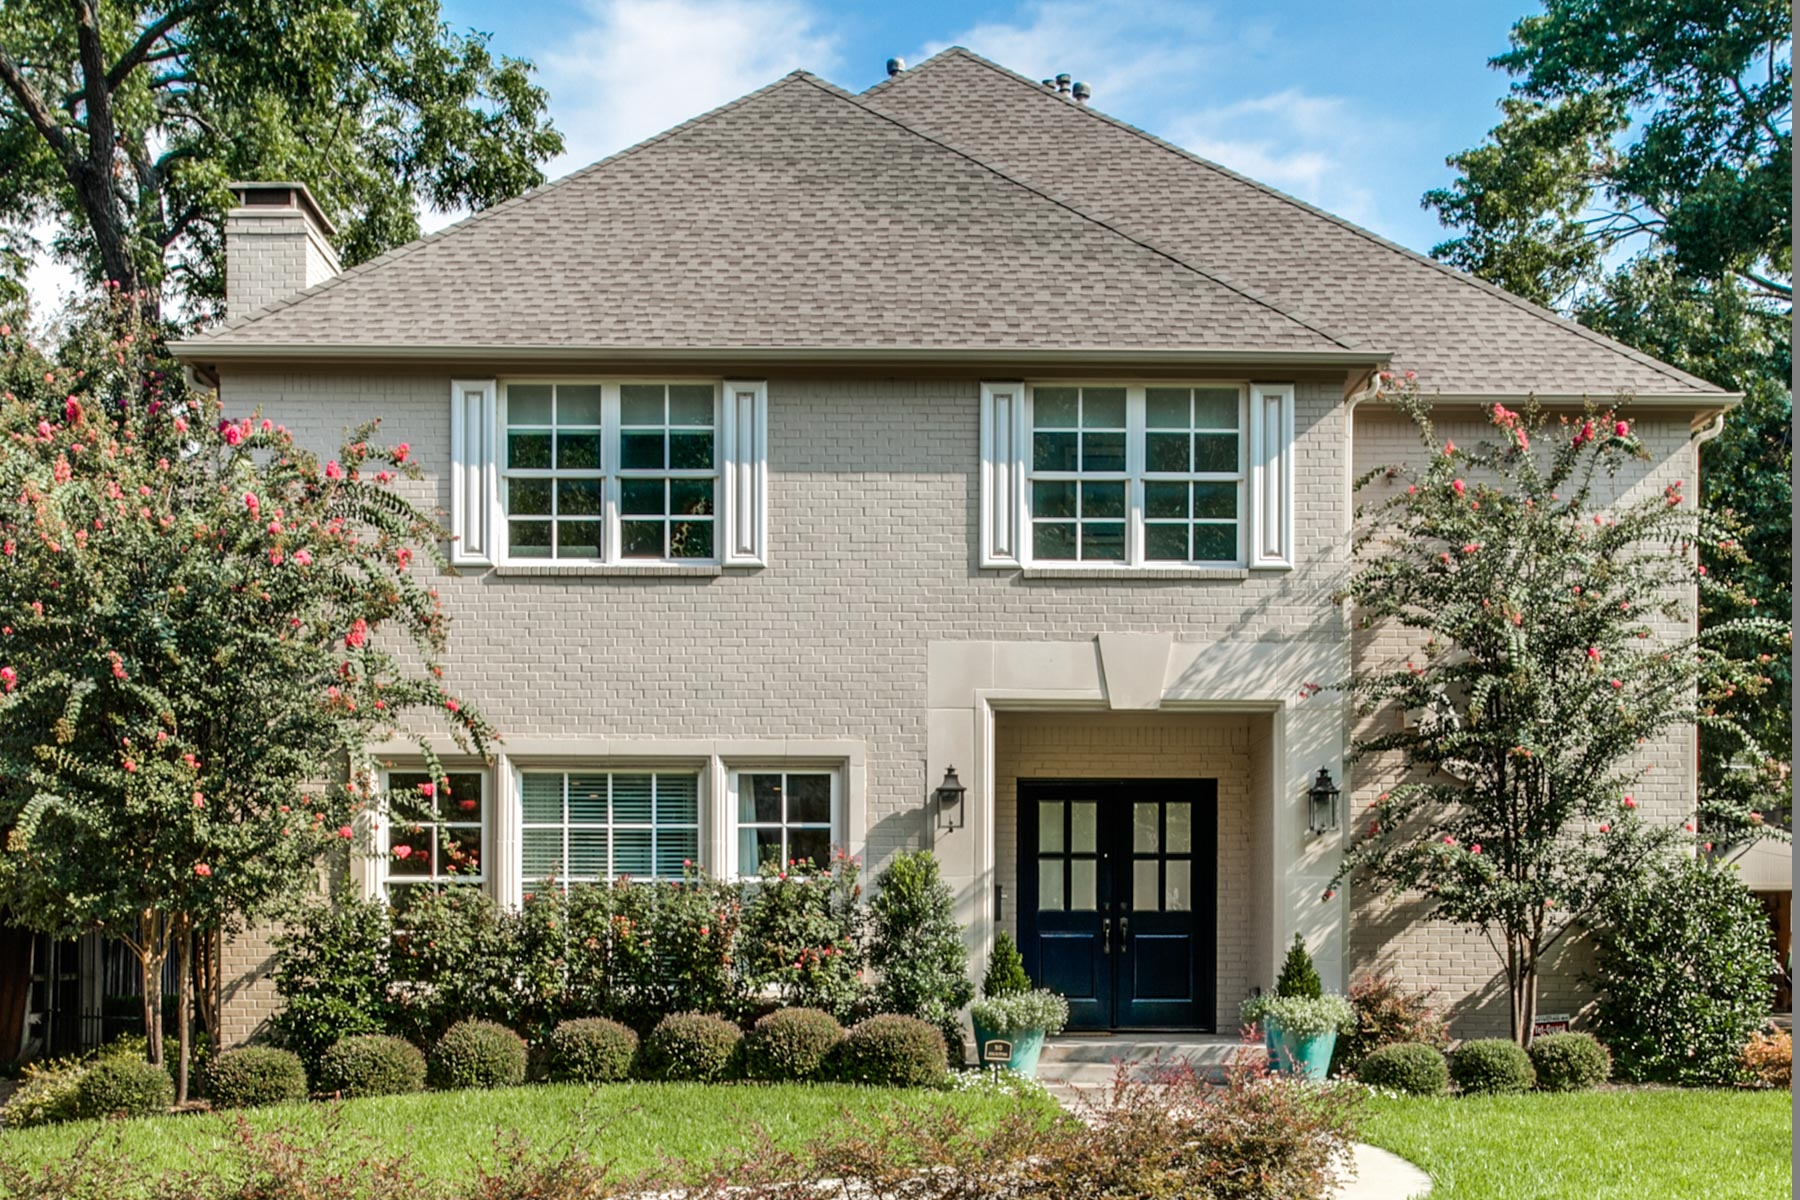 獨棟家庭住宅 為 出售 在 Classic Greenway Crest Home 5317 Emerson Avenue Dallas, 德克薩斯州, 75209 美國